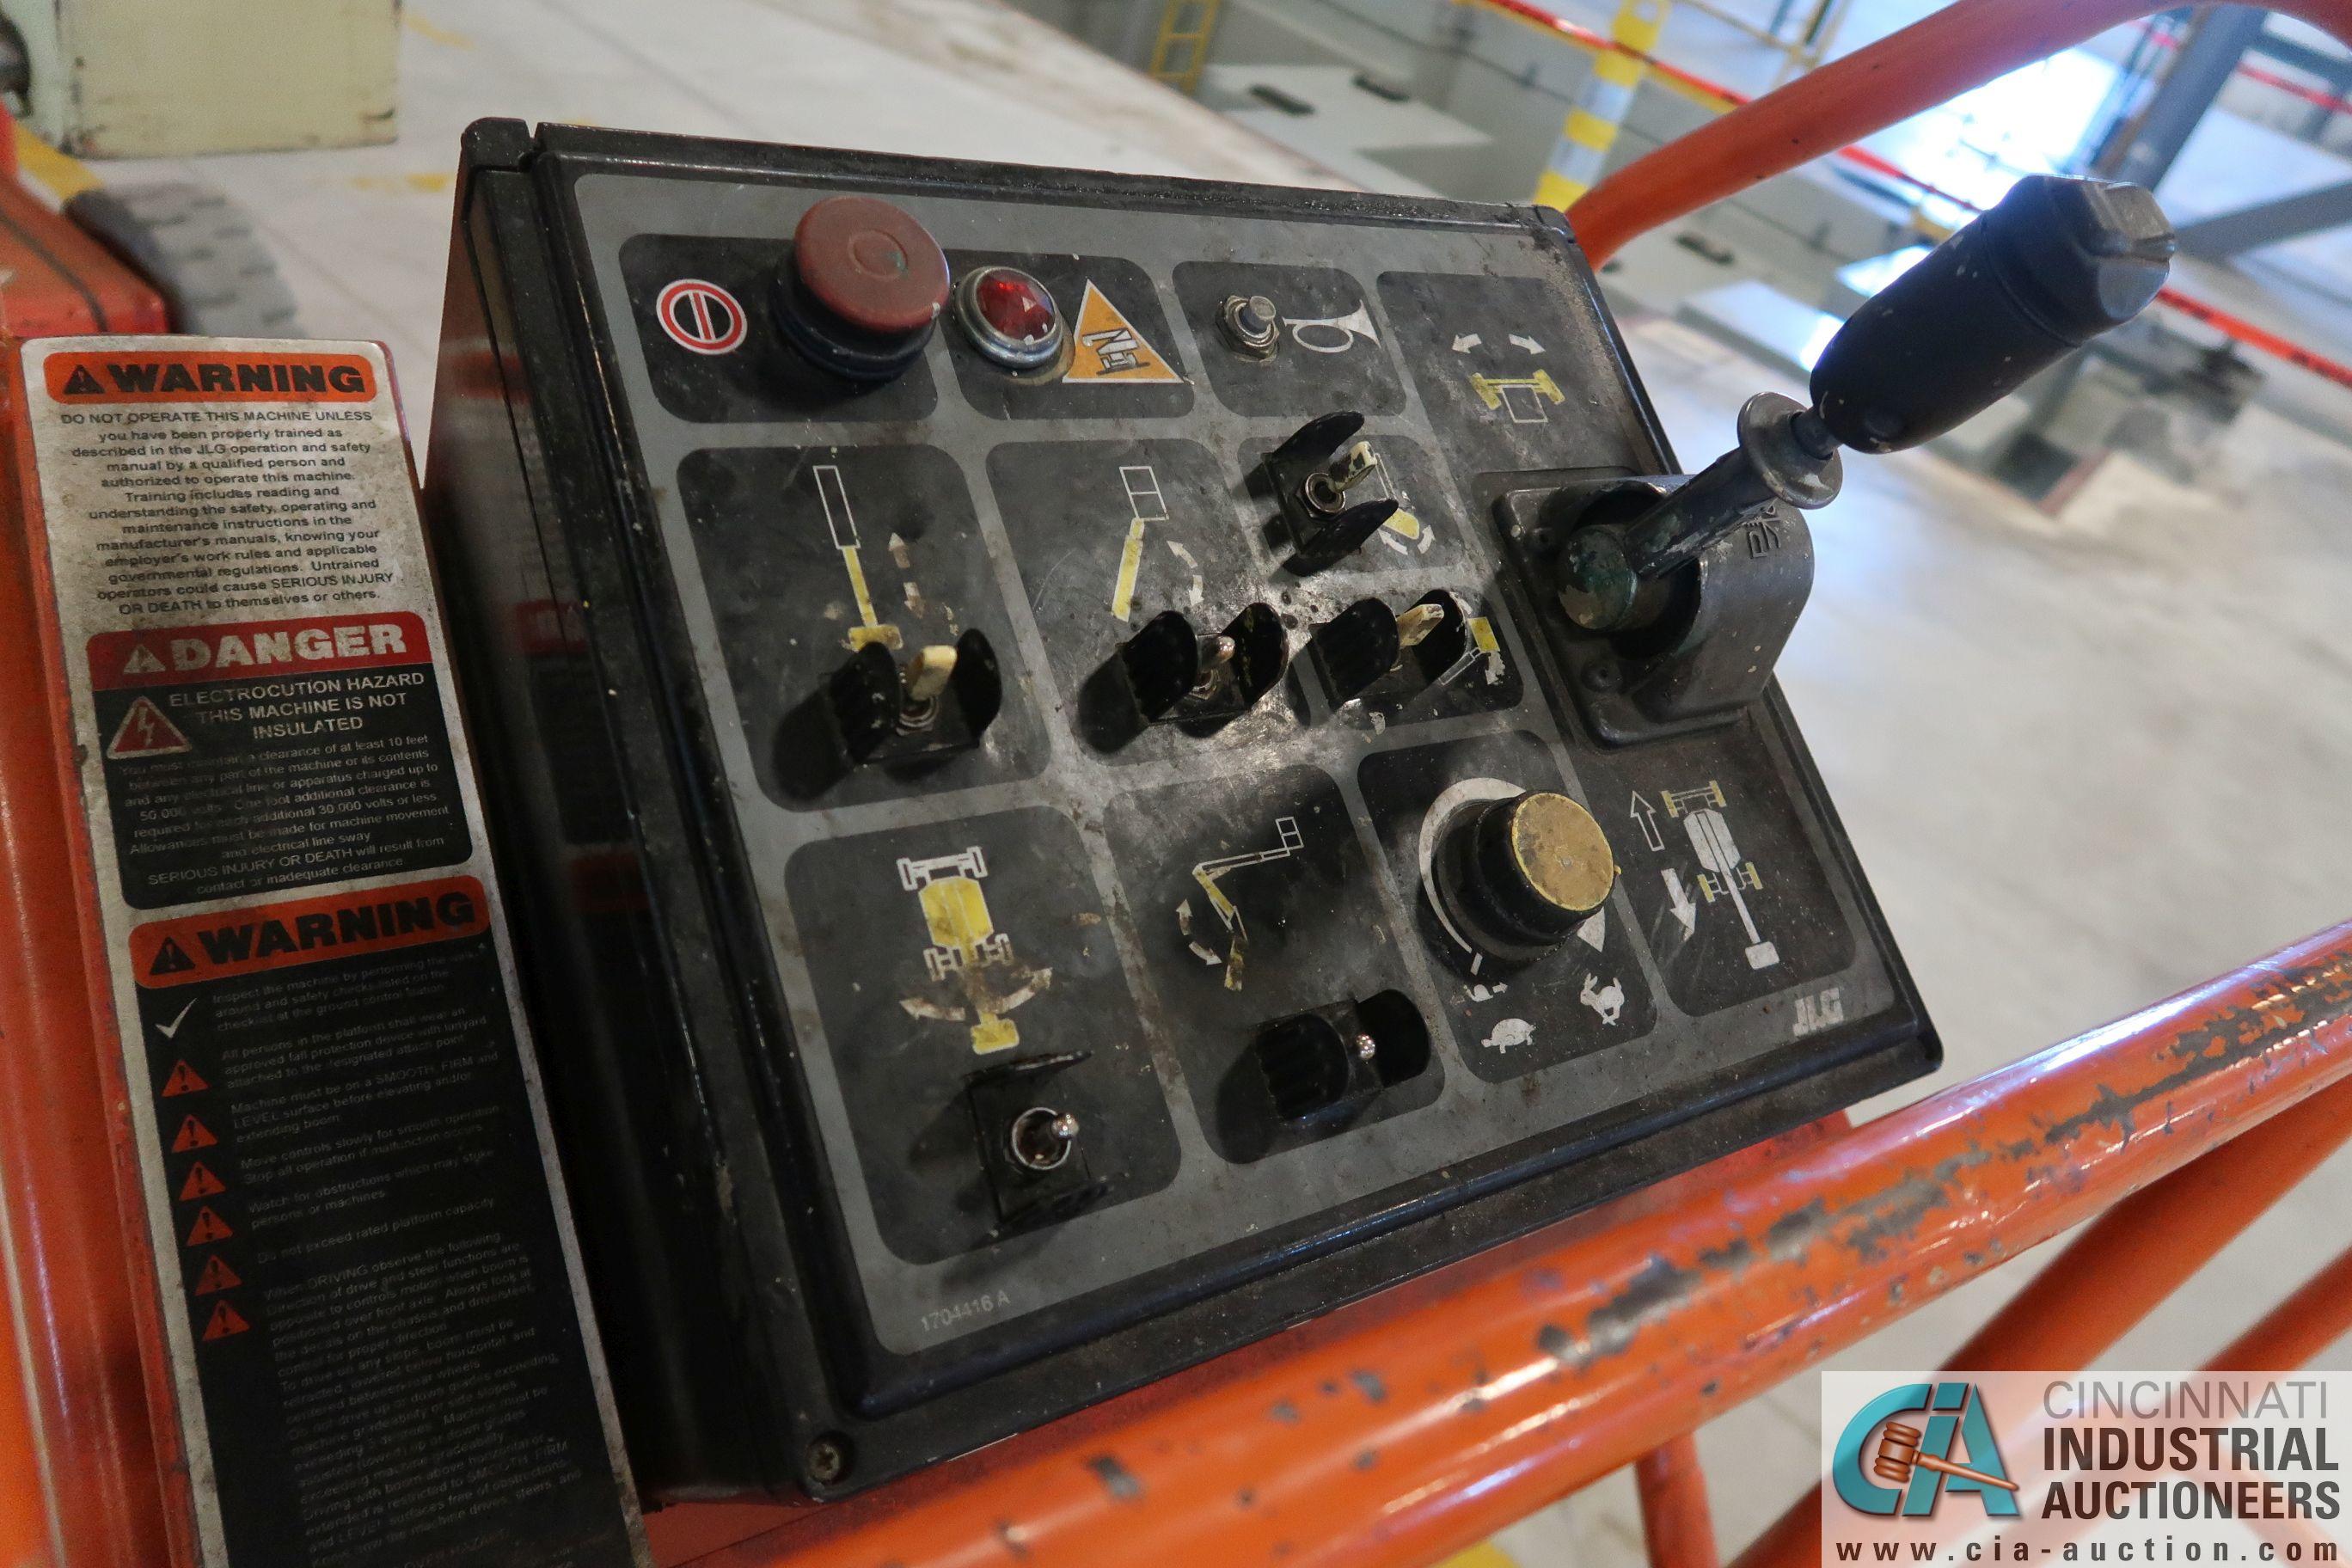 40' JLG MODEL N40 ELECTRIC BOOM LIFT; S/N 33882, 500 LB CAPACITY, 503 HOURS SHOWING (MFG YEAR 1998) - Image 7 of 9